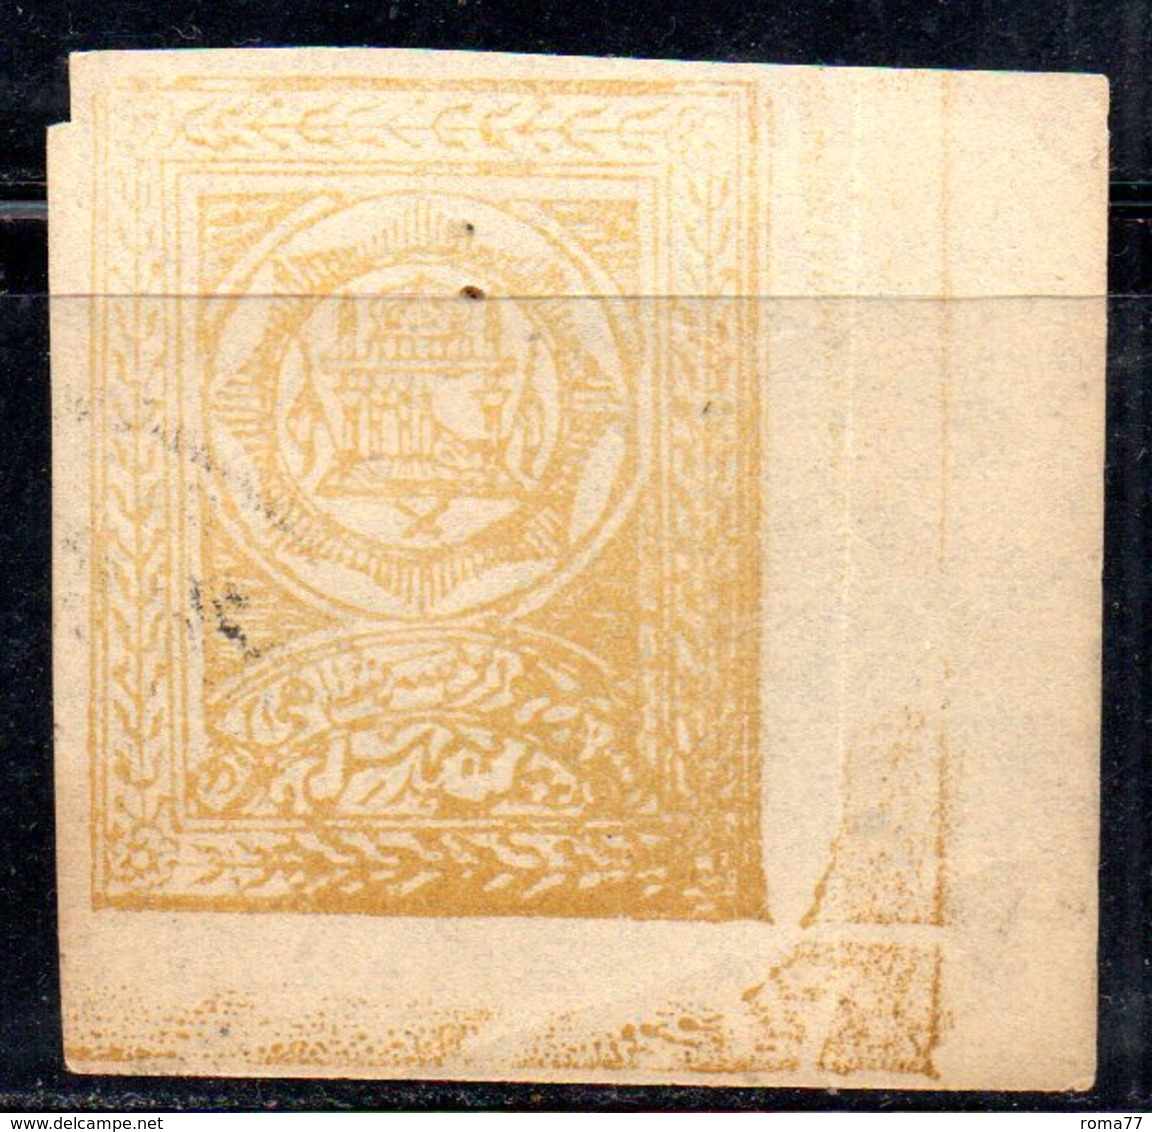 634 490 - AFGANISTAN AFGHANISTAN , Pacchi Postali Il N. 1  Usato Angolo Di Foglio - Afghanistan